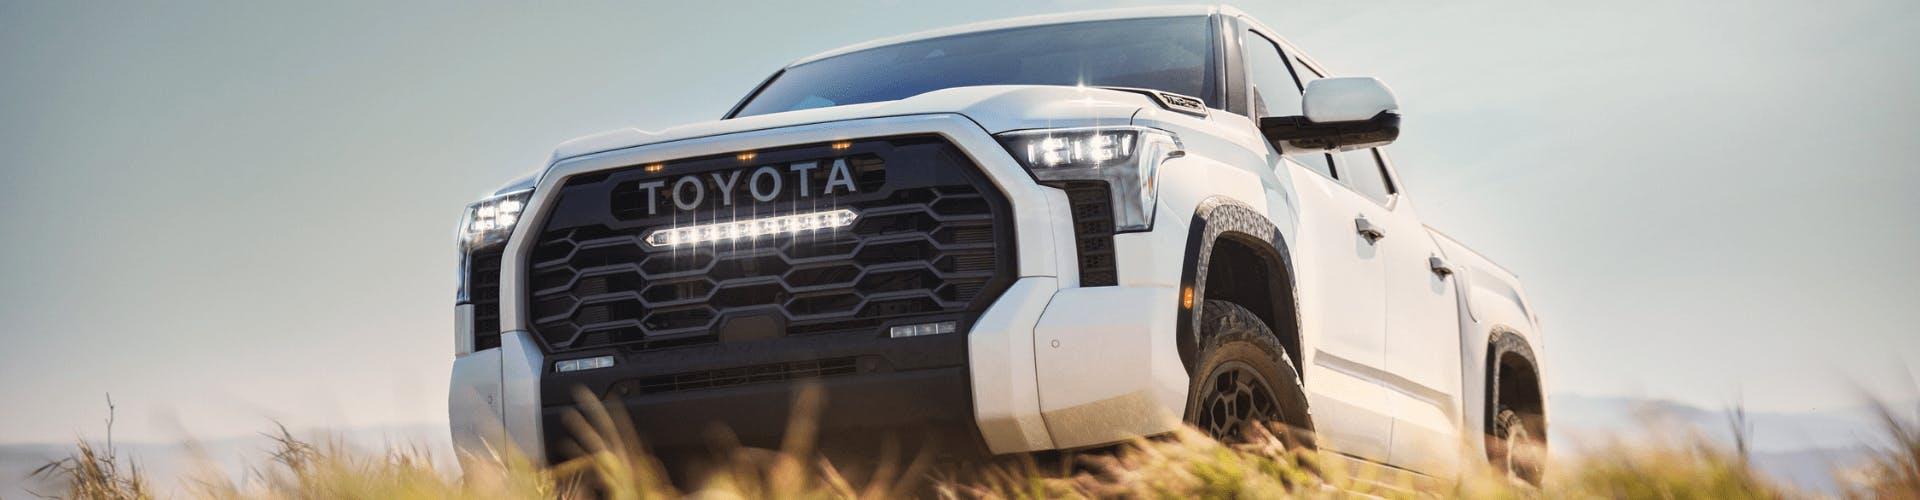 Welcome to Warrenton Toyota